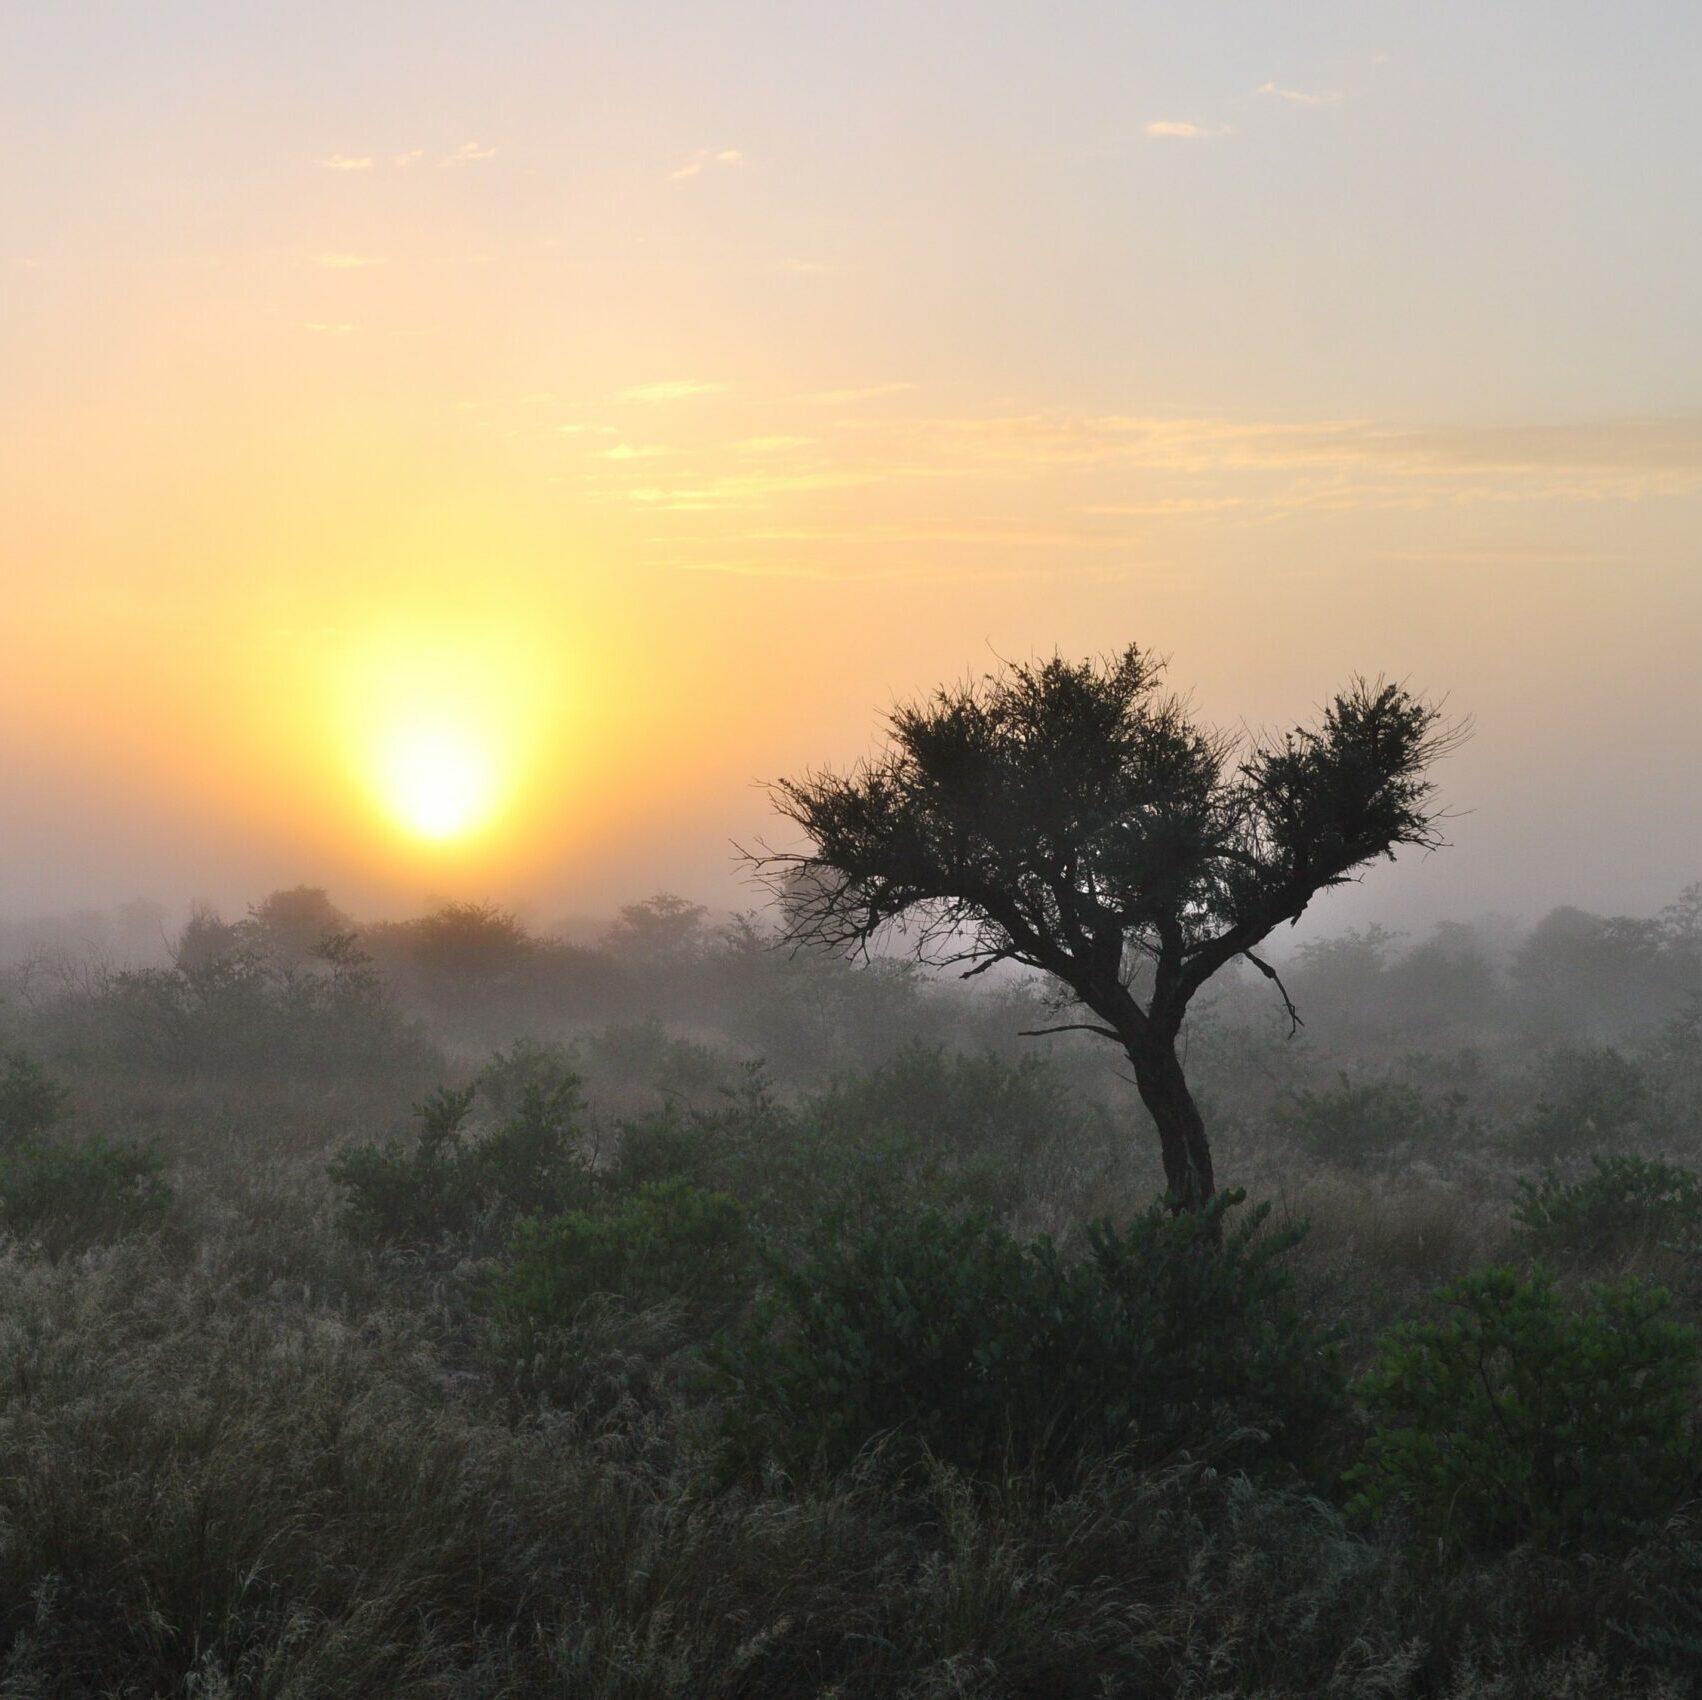 Sunrise over the Central Kalahari Game Reserve in Botswana